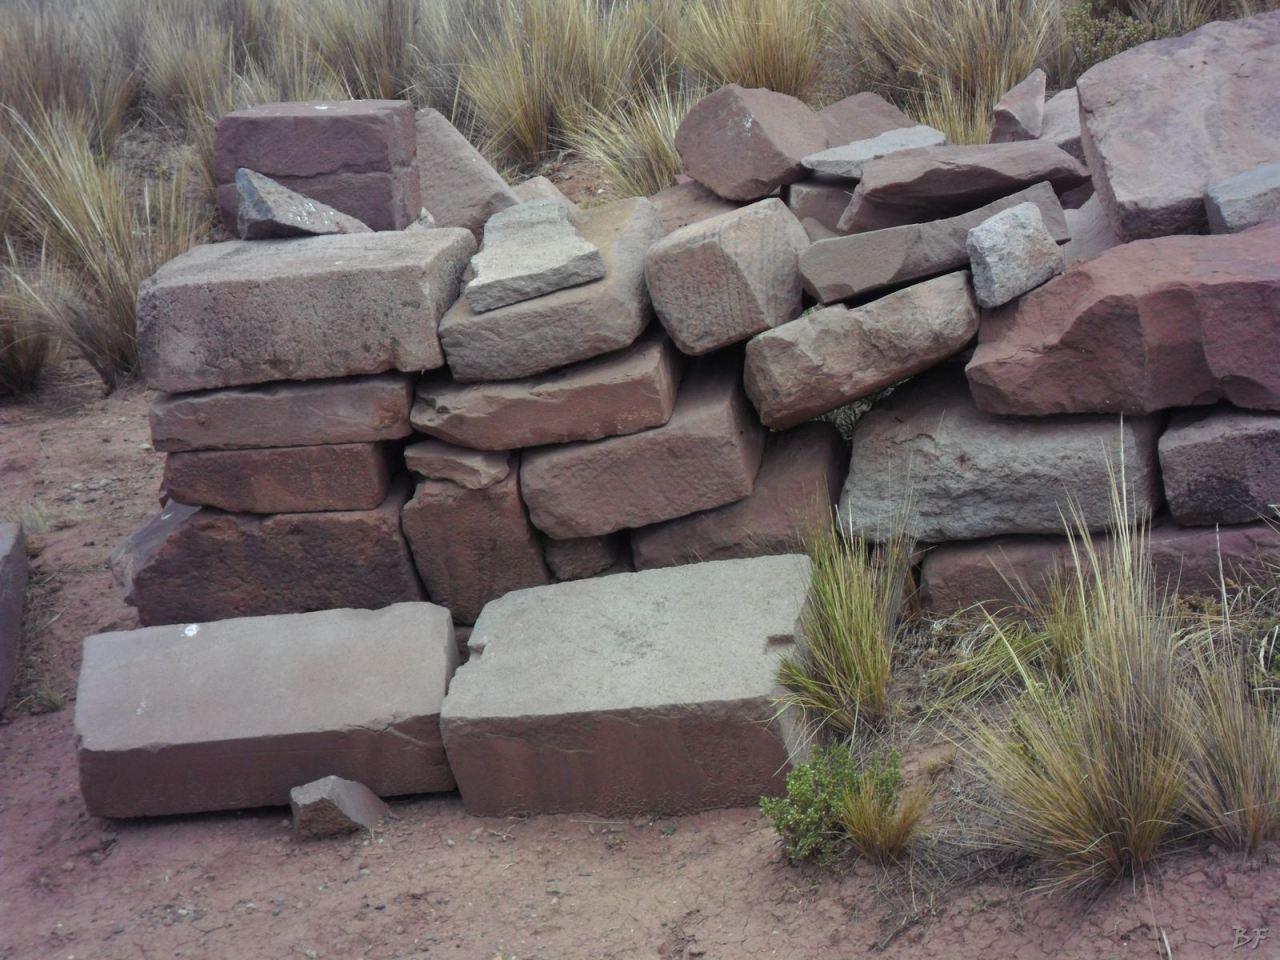 Sito-Megalitico-Piramide-Akapana-Kalasasaya-Menhir-Tiahuanaco-Bolivia-111